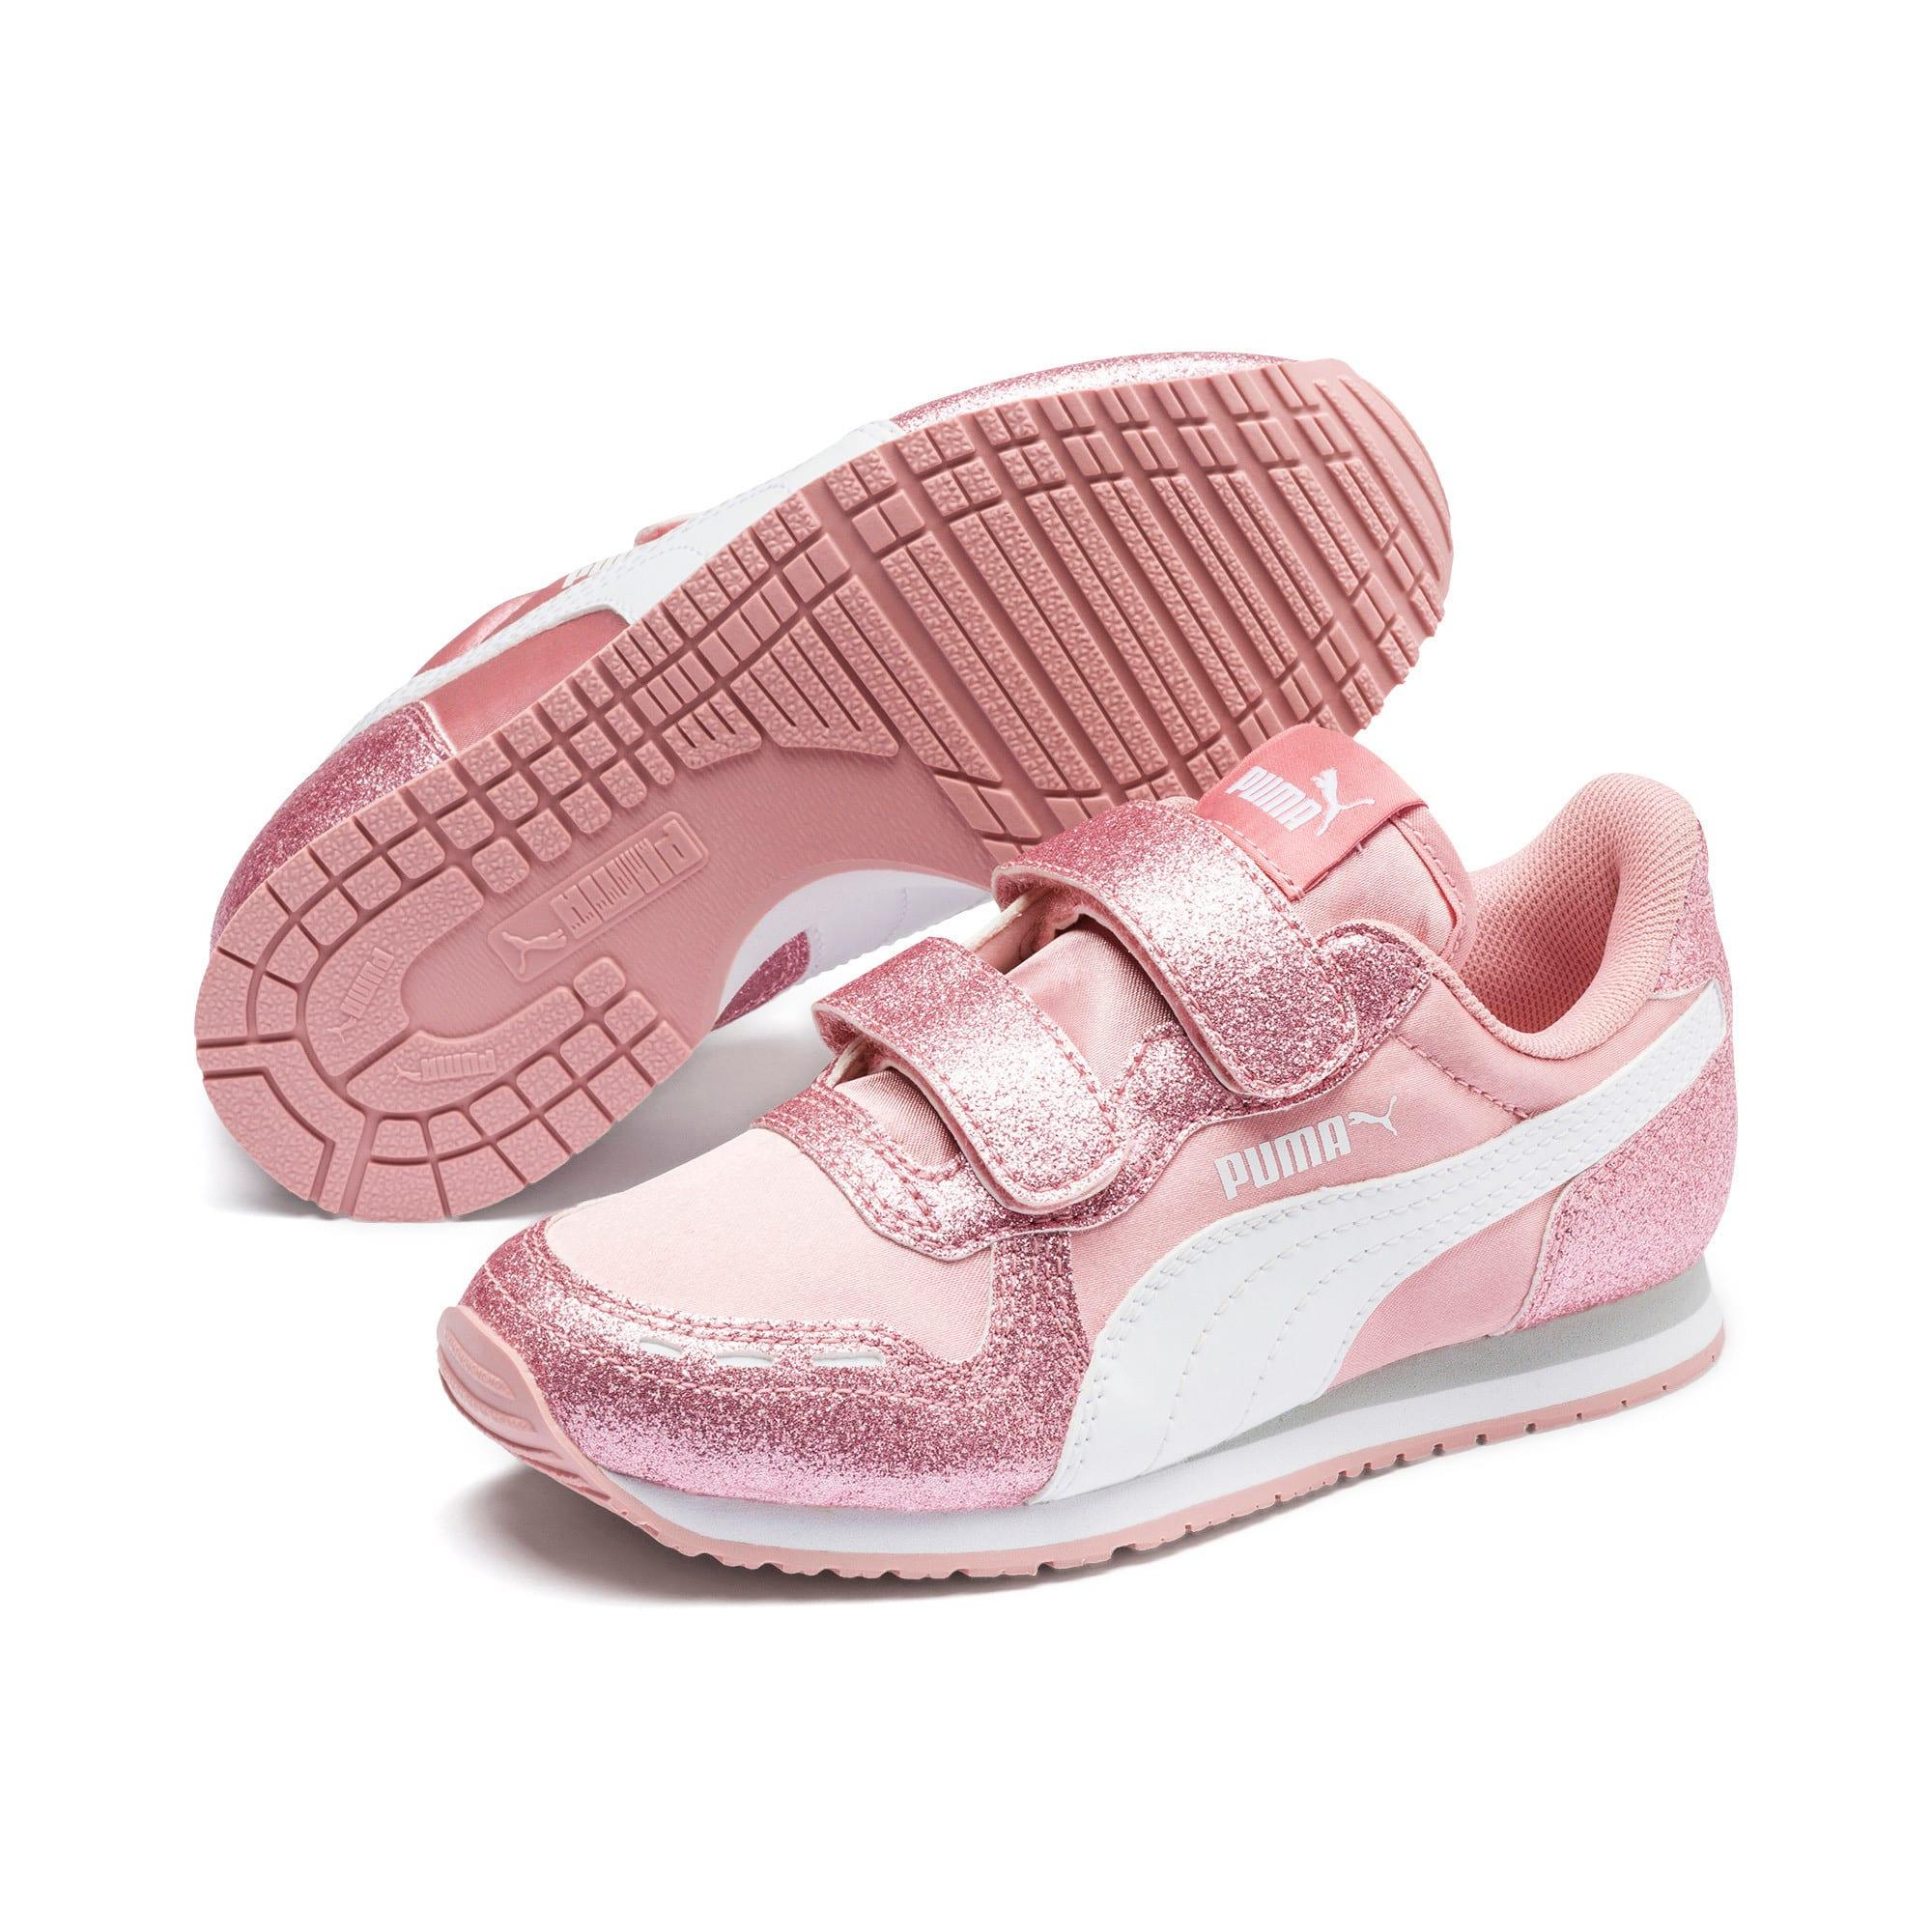 Thumbnail 2 of Cabana Racer Glitz AC Shoes PS, Bridal Rose-Puma White, medium